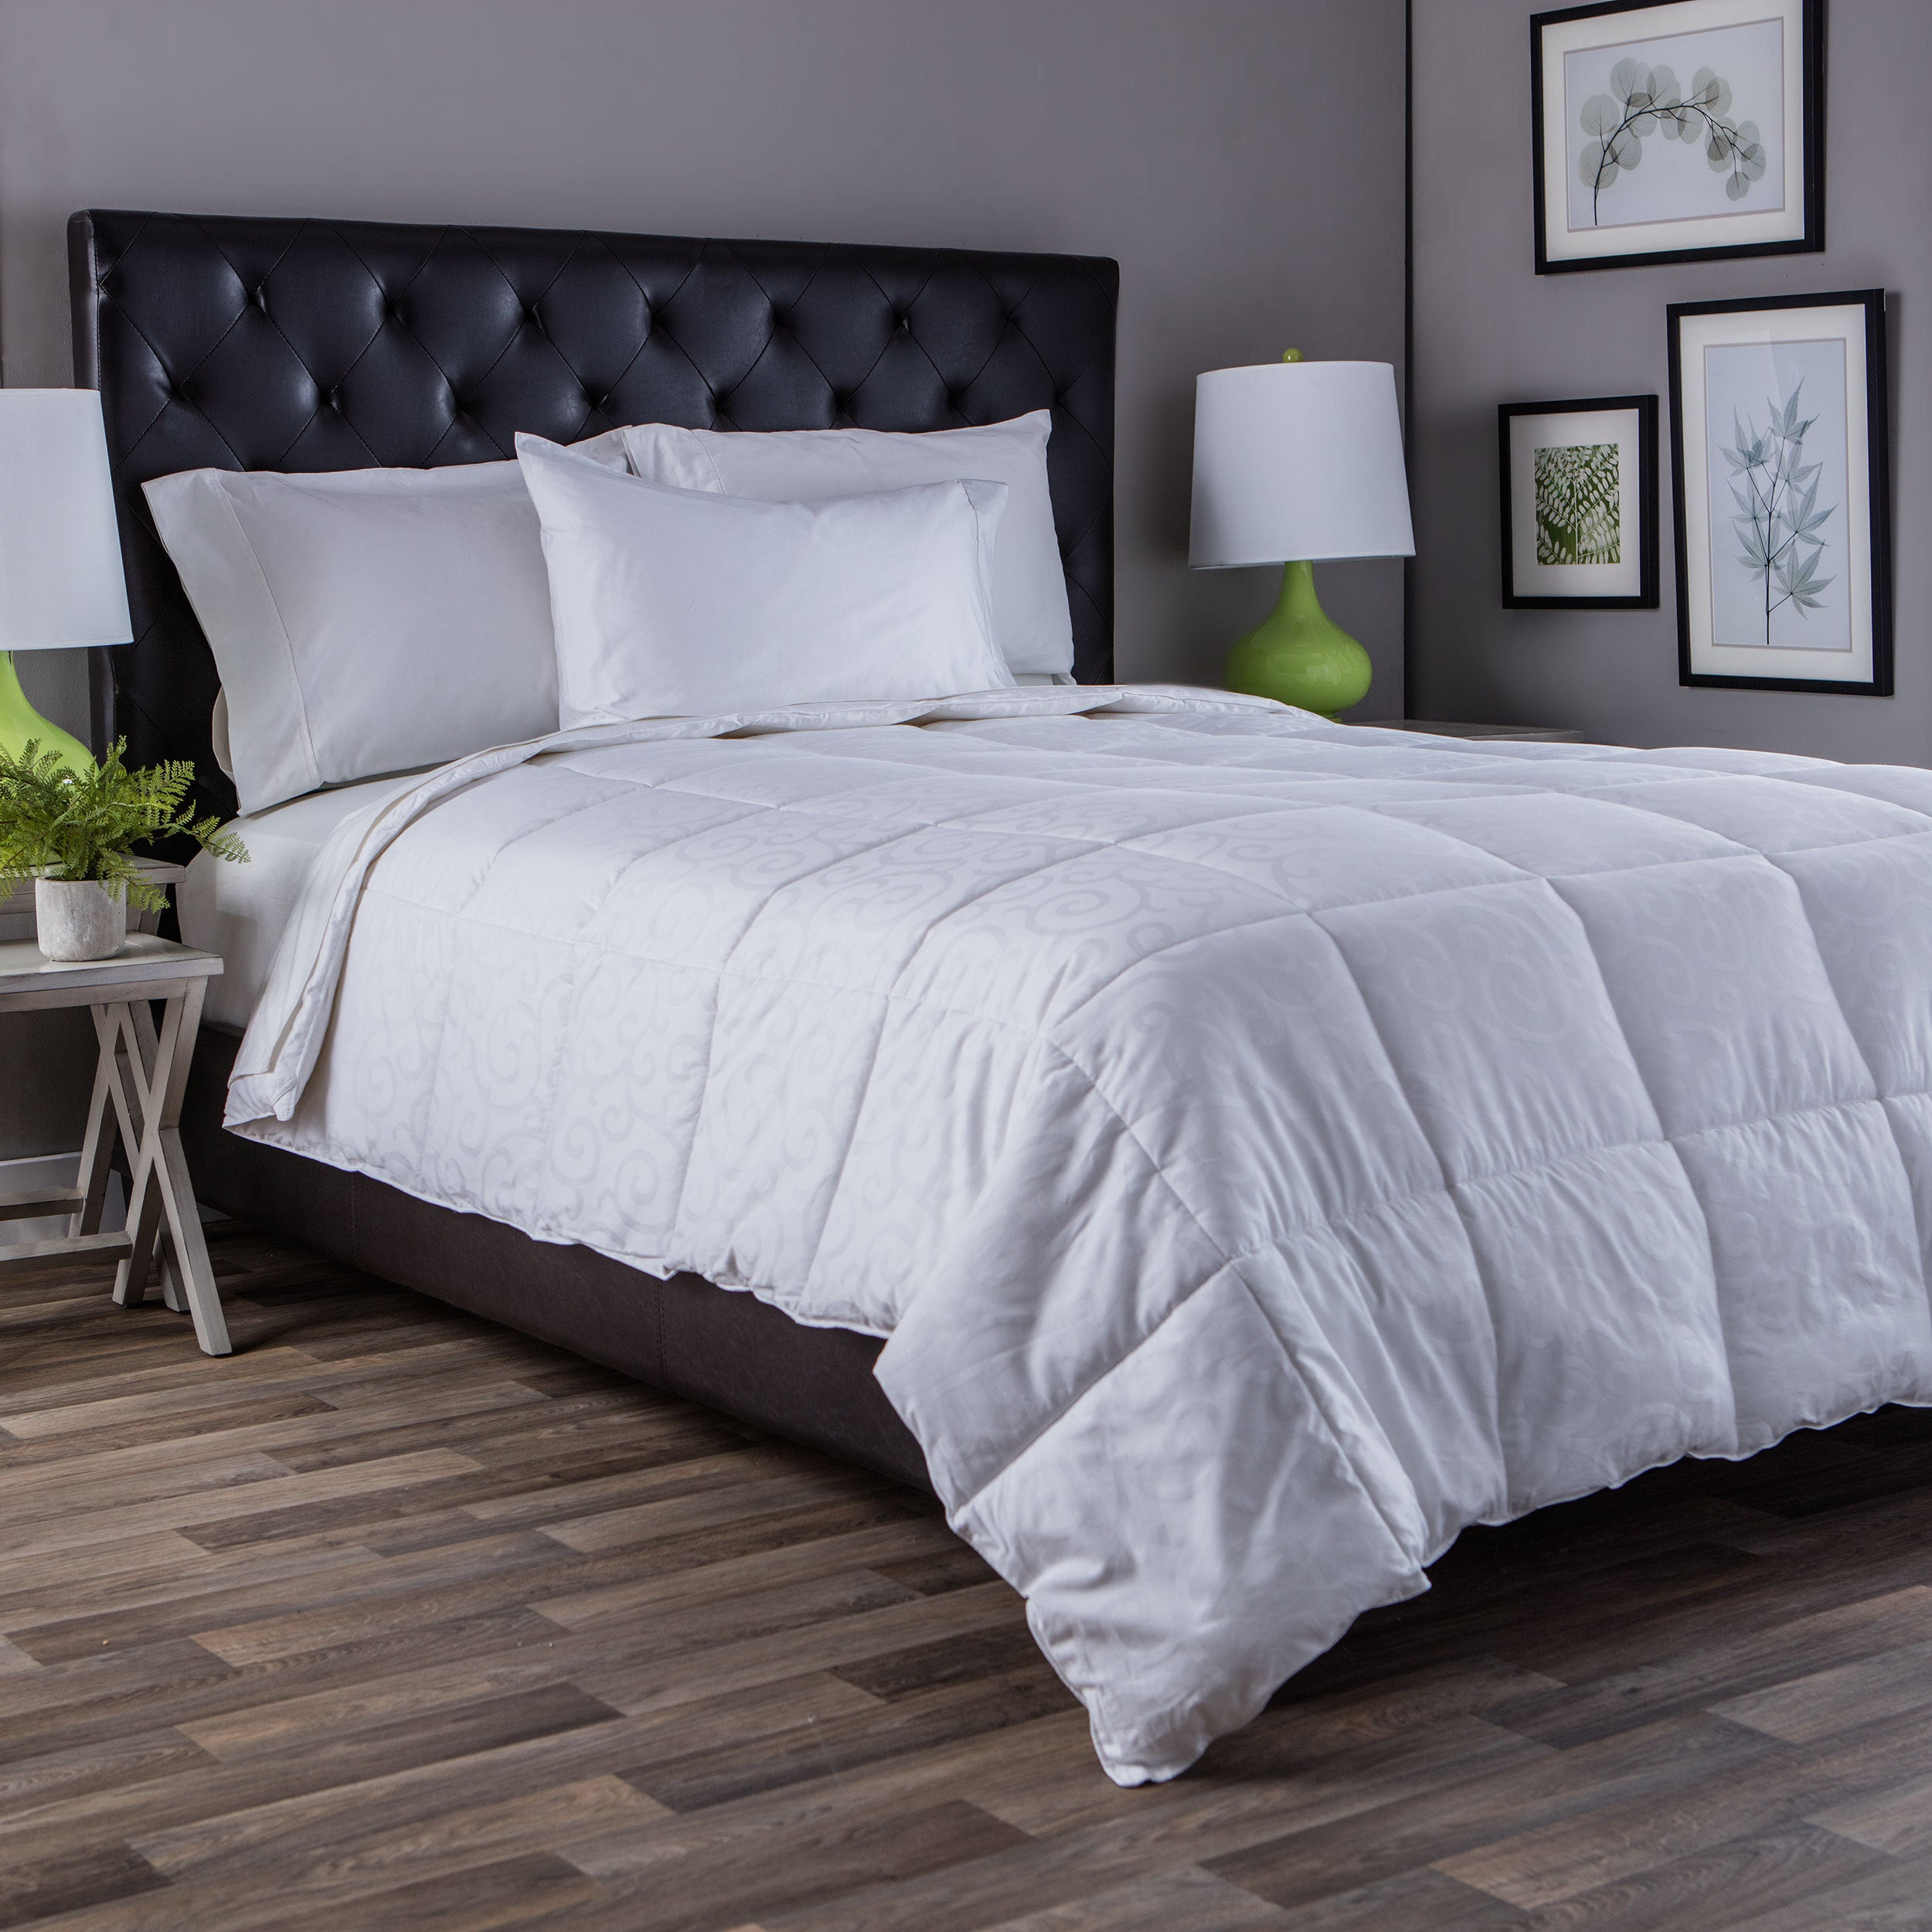 pdx all reviews seasons comforter alternative down wayfair puredown bath bed